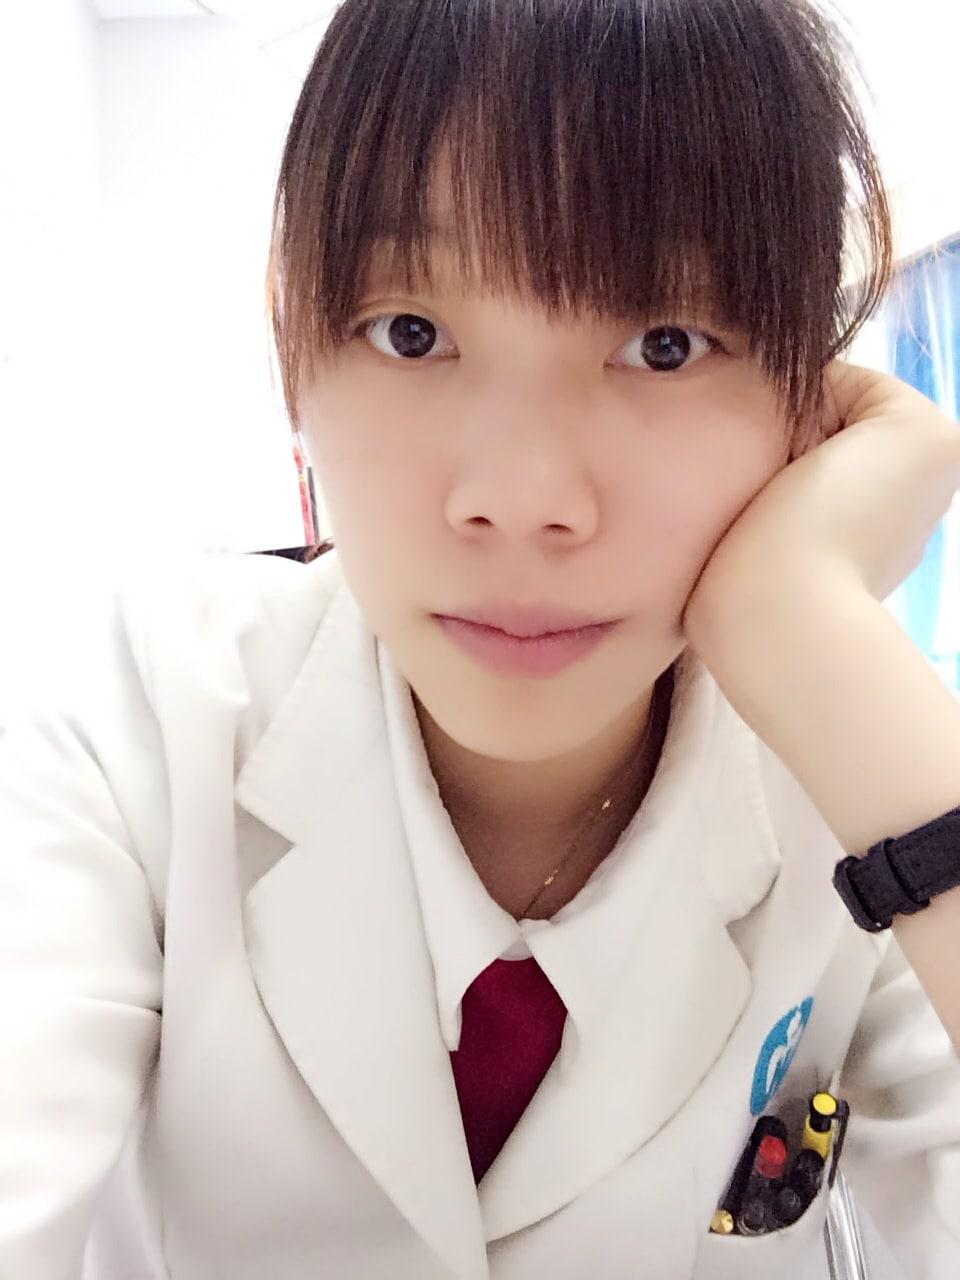 婷 from Guangzhou